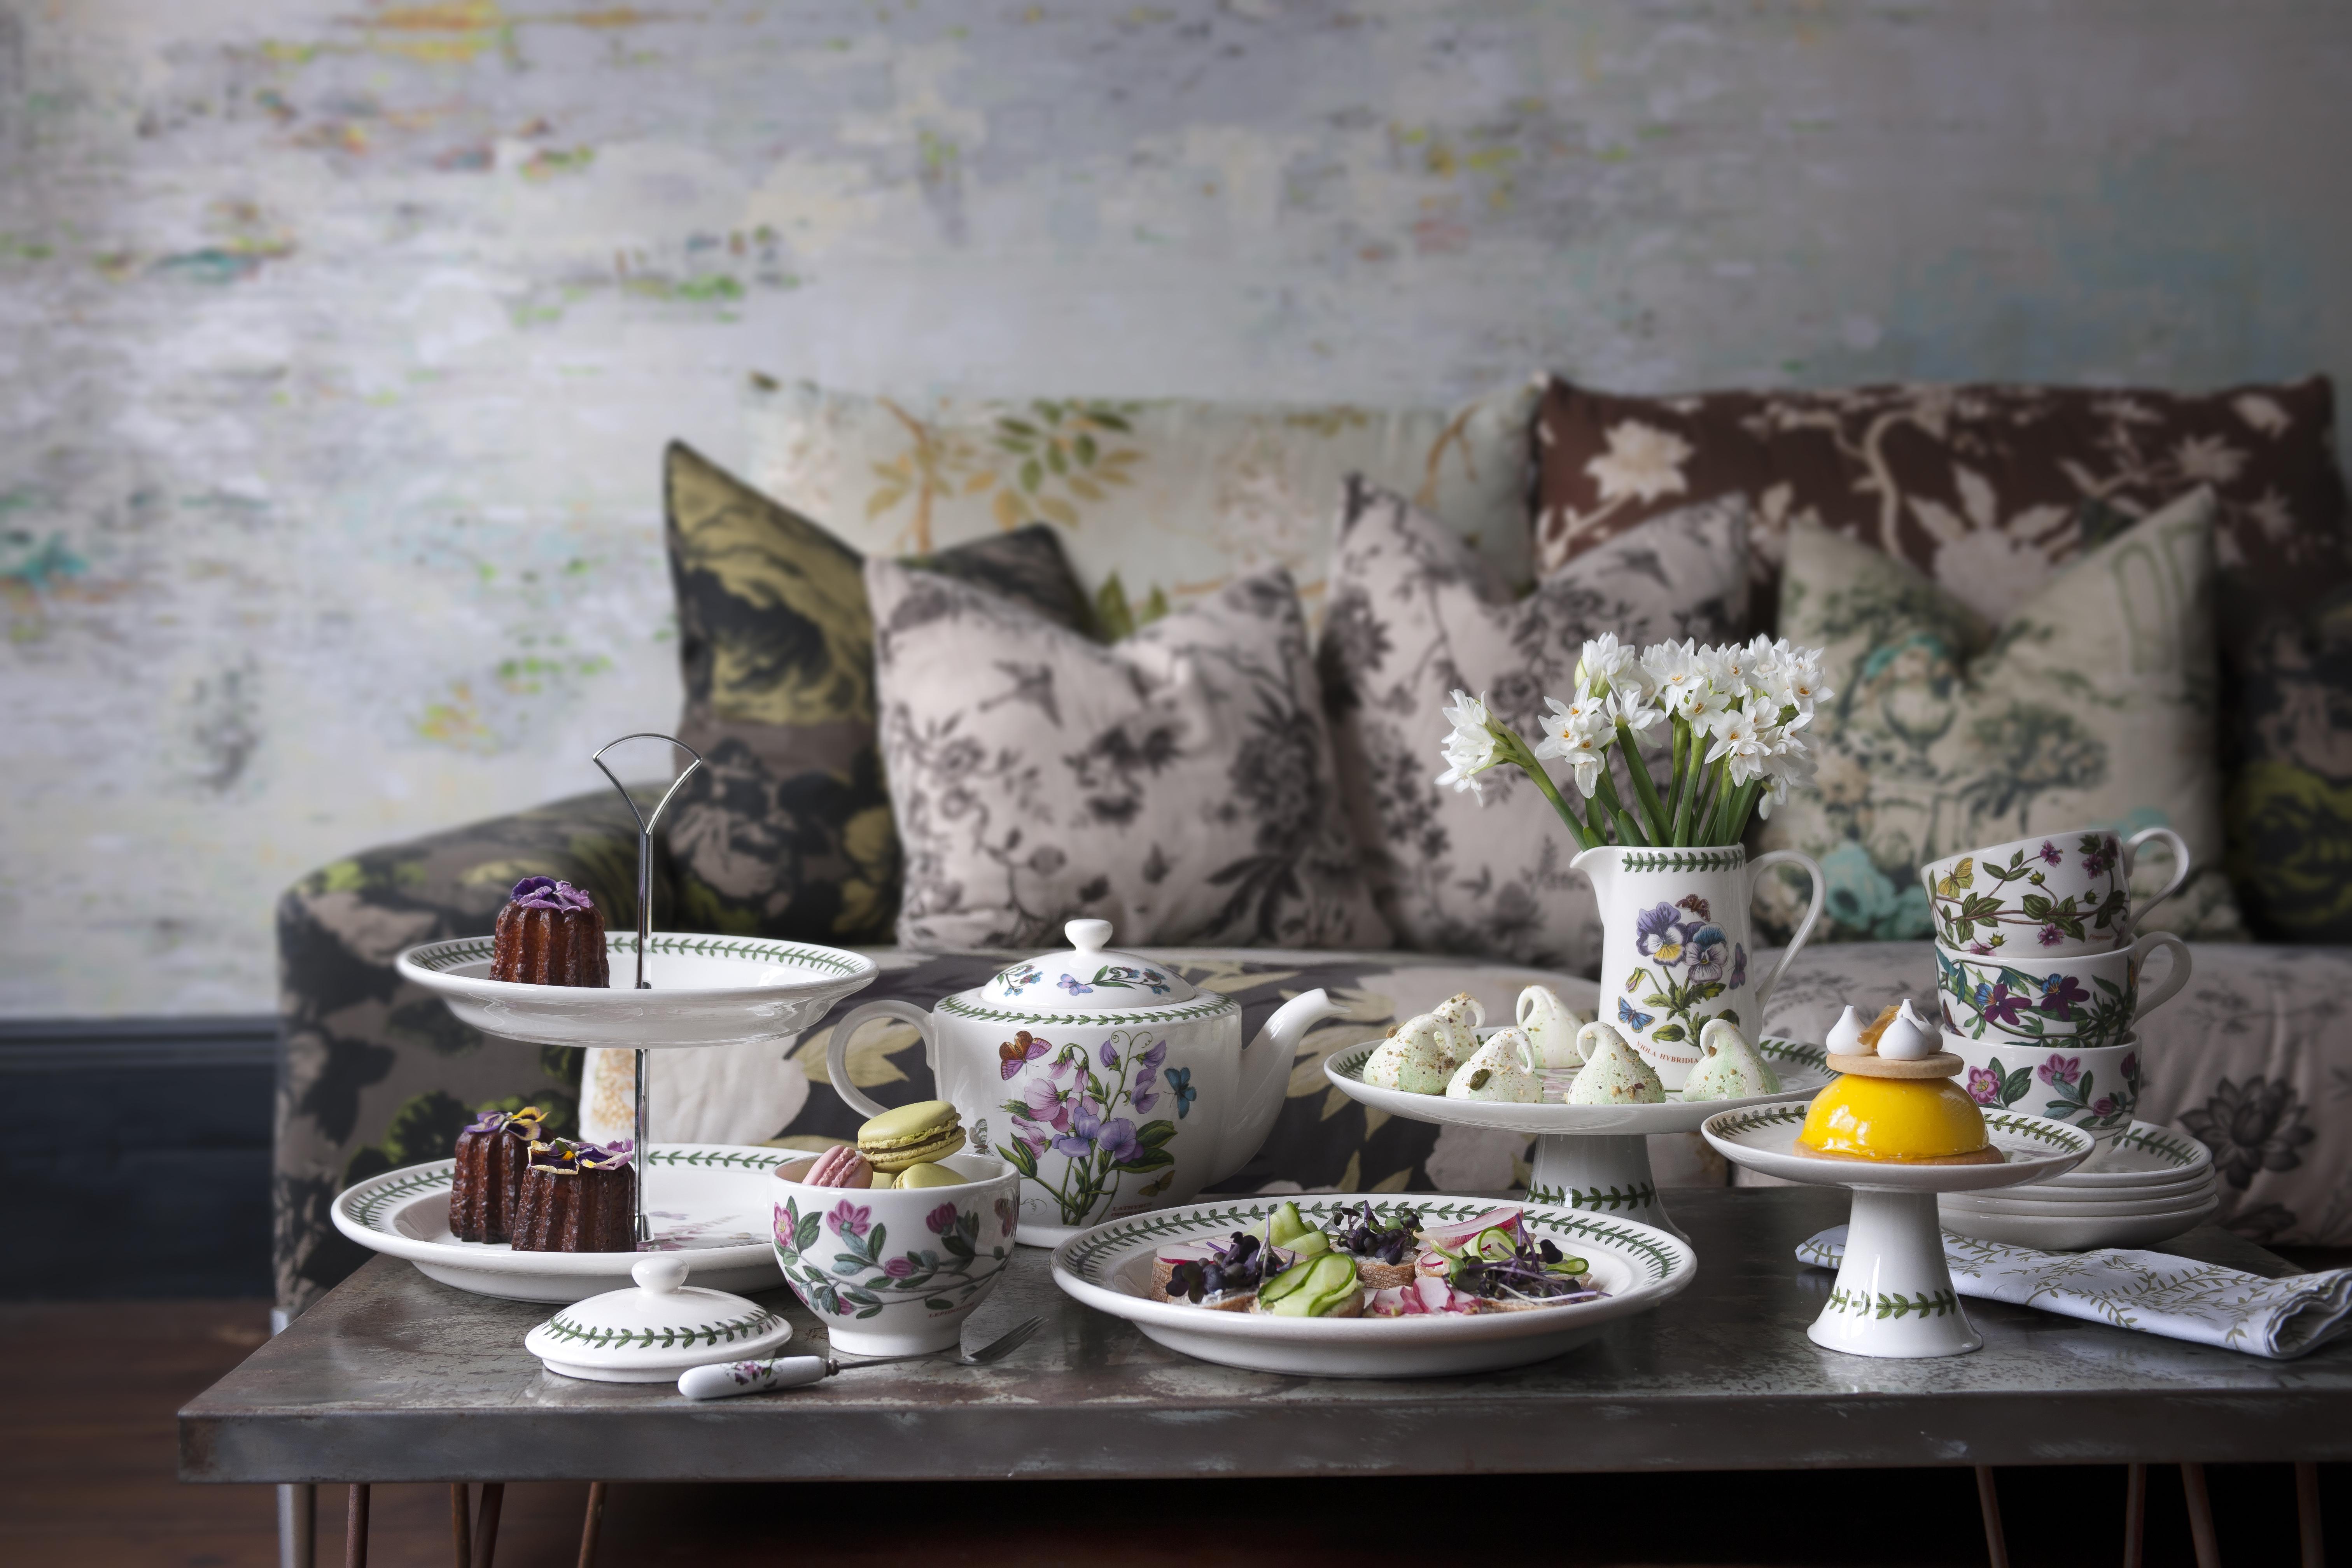 Afternoon Tea Week - The History of Afternoon Tea